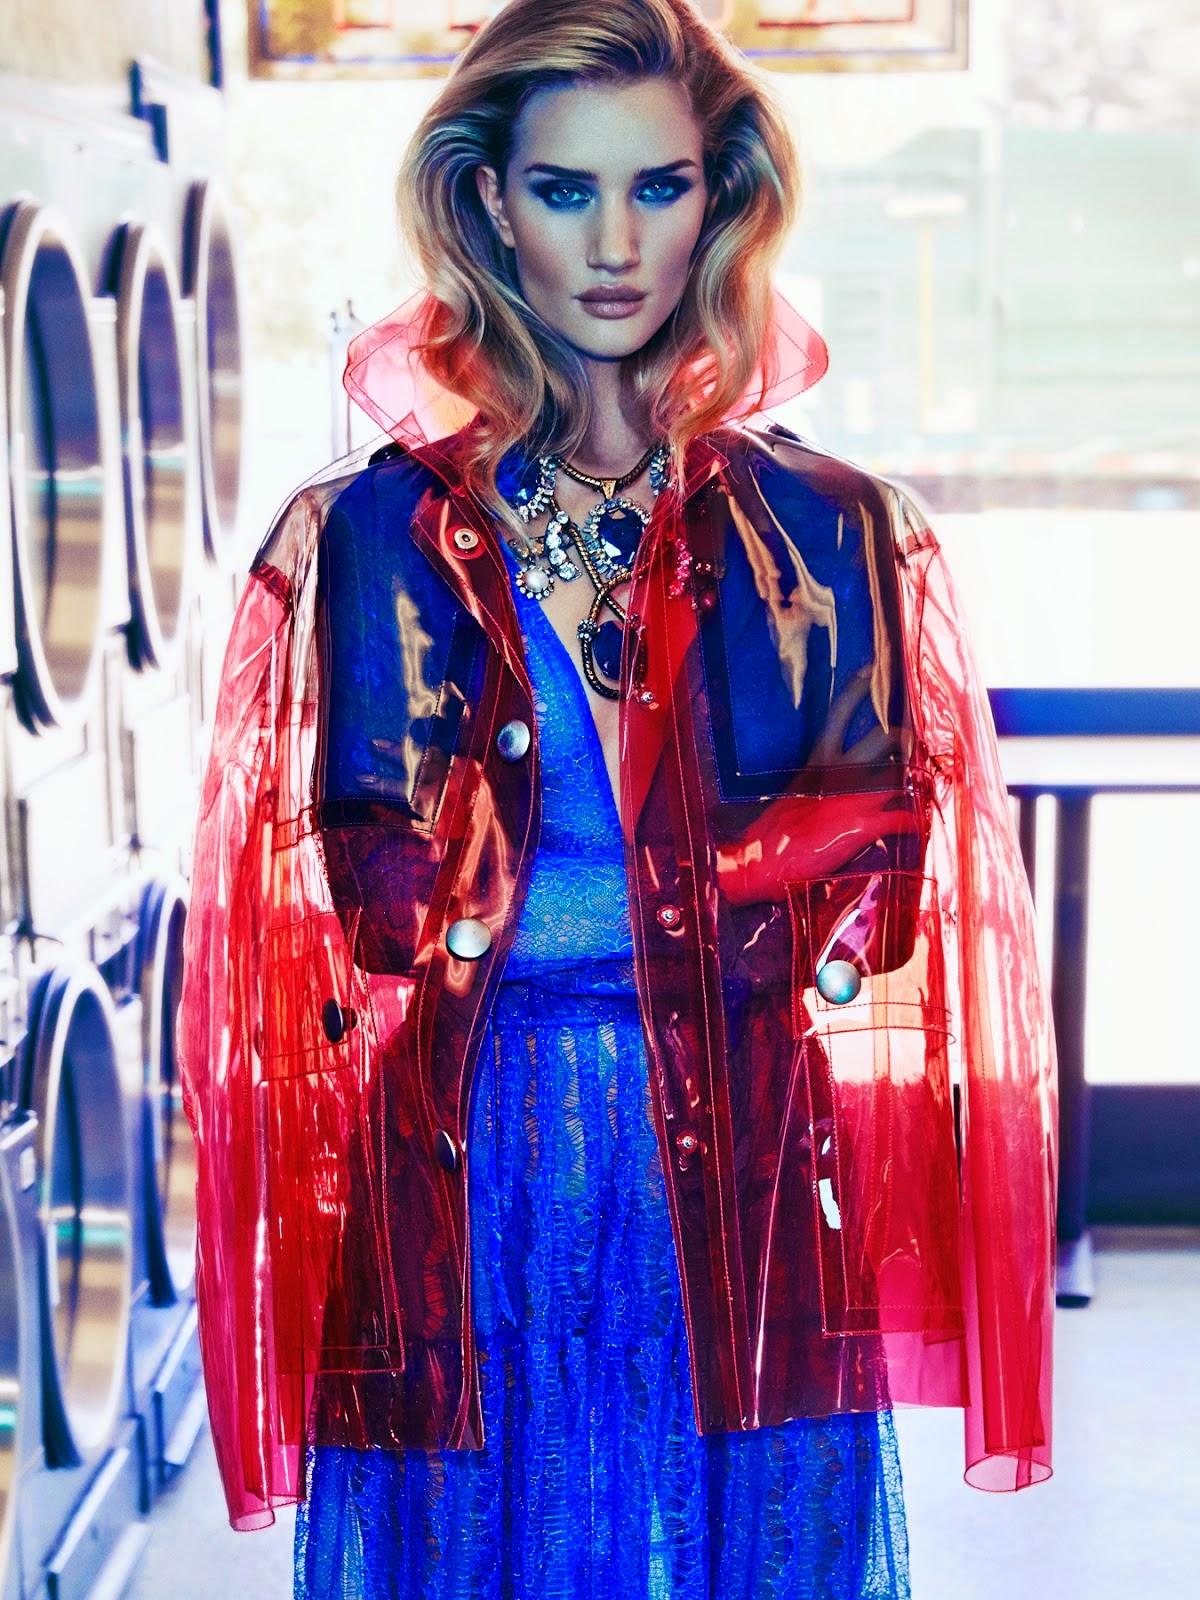 British supermodel Rosie Huntington-Whiteley By James Macari For Vogue Mexico November 2014